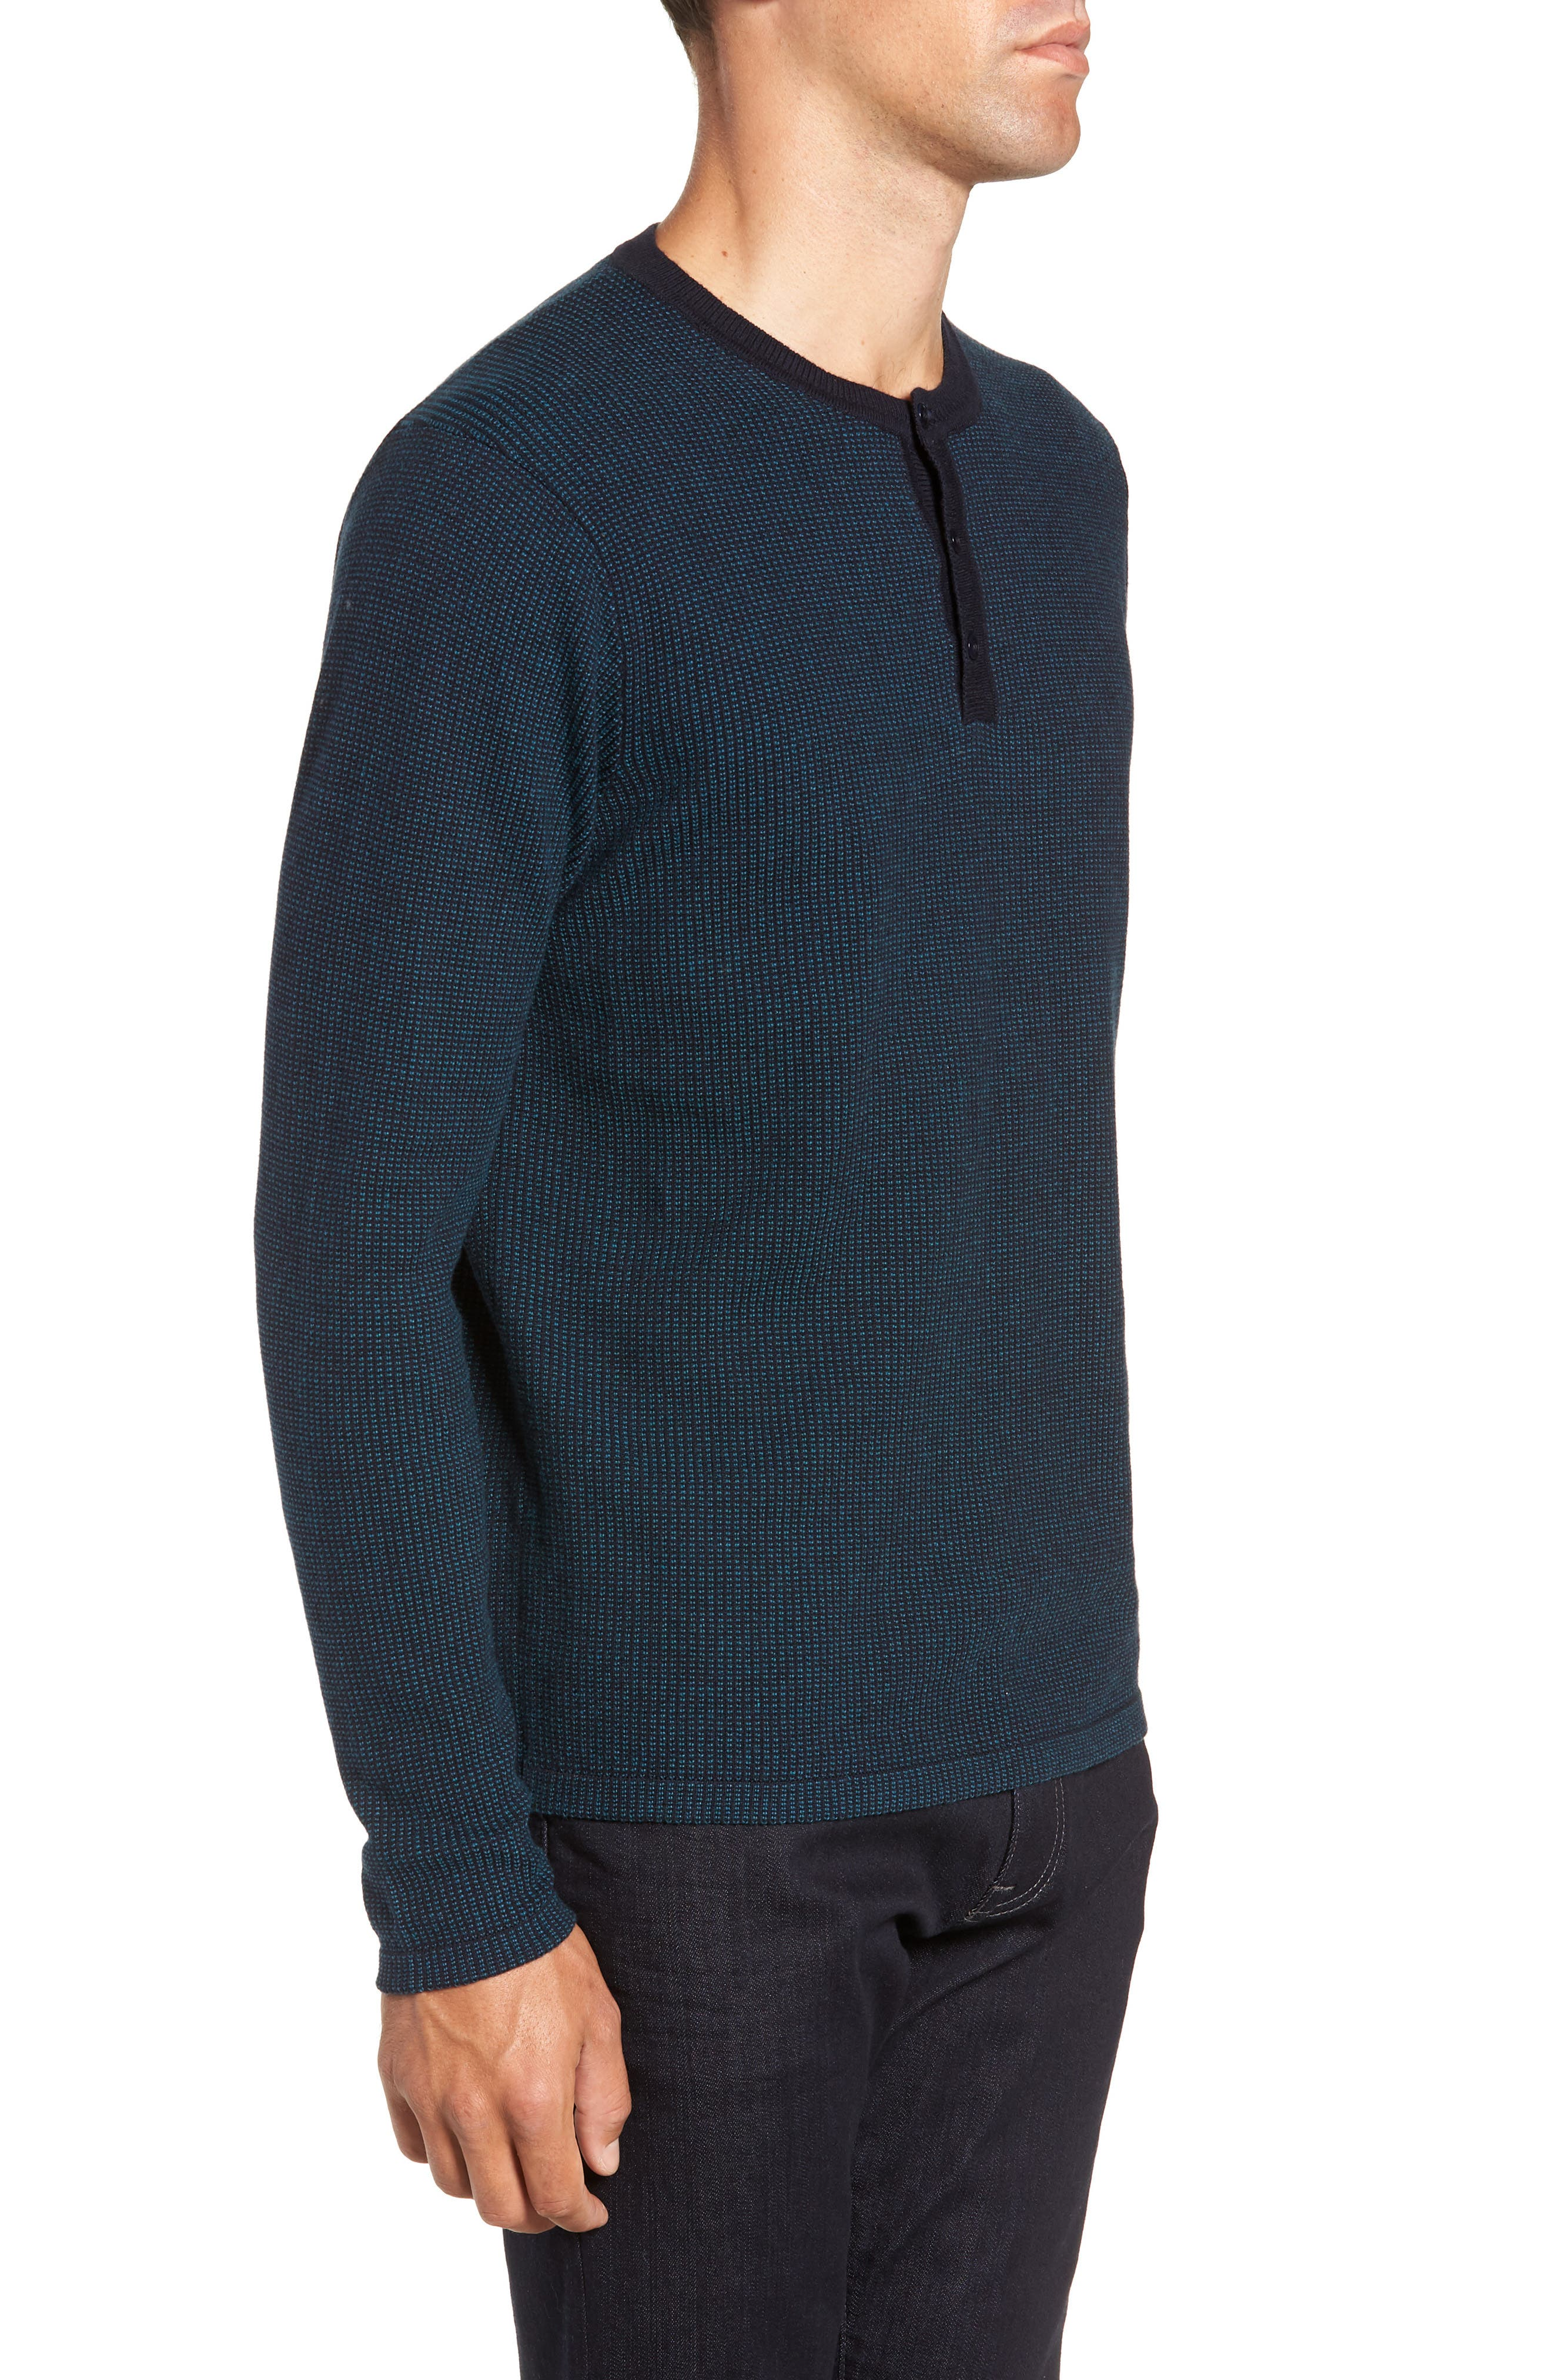 ZACHARY PRELL, Kimball Henley Sweater, Alternate thumbnail 3, color, EMERALD